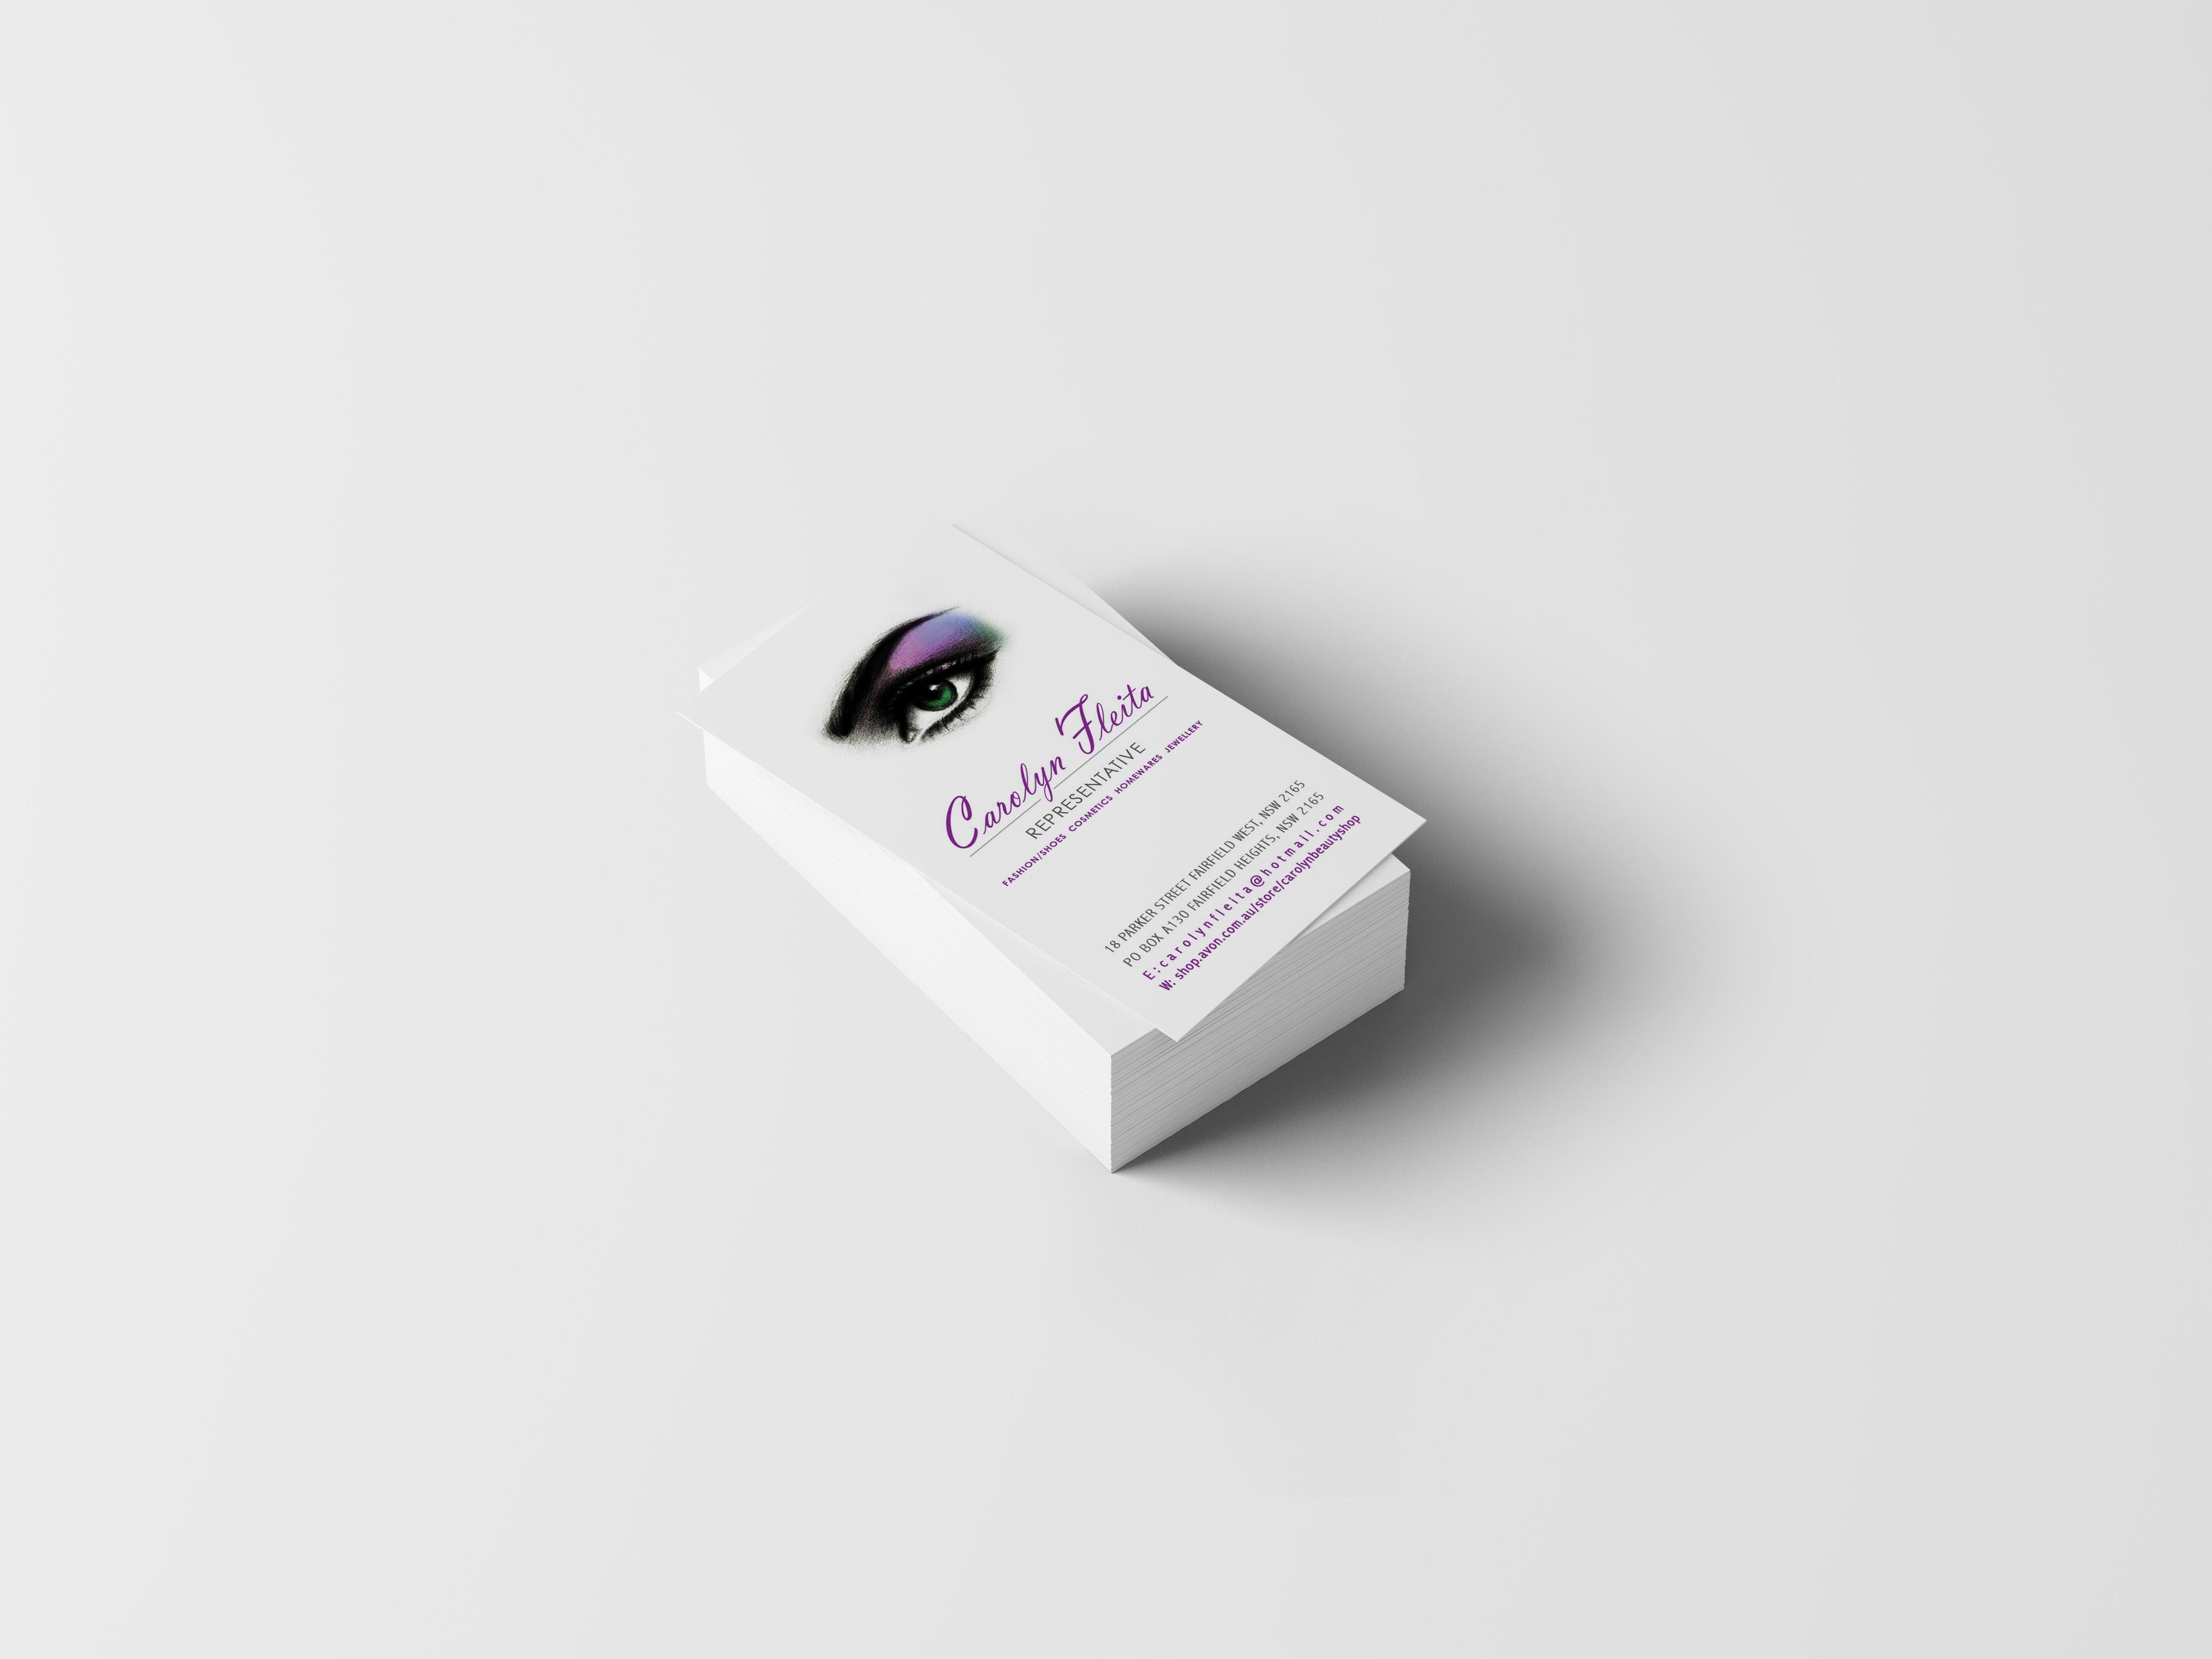 Avon Business Card updated - NF Designs